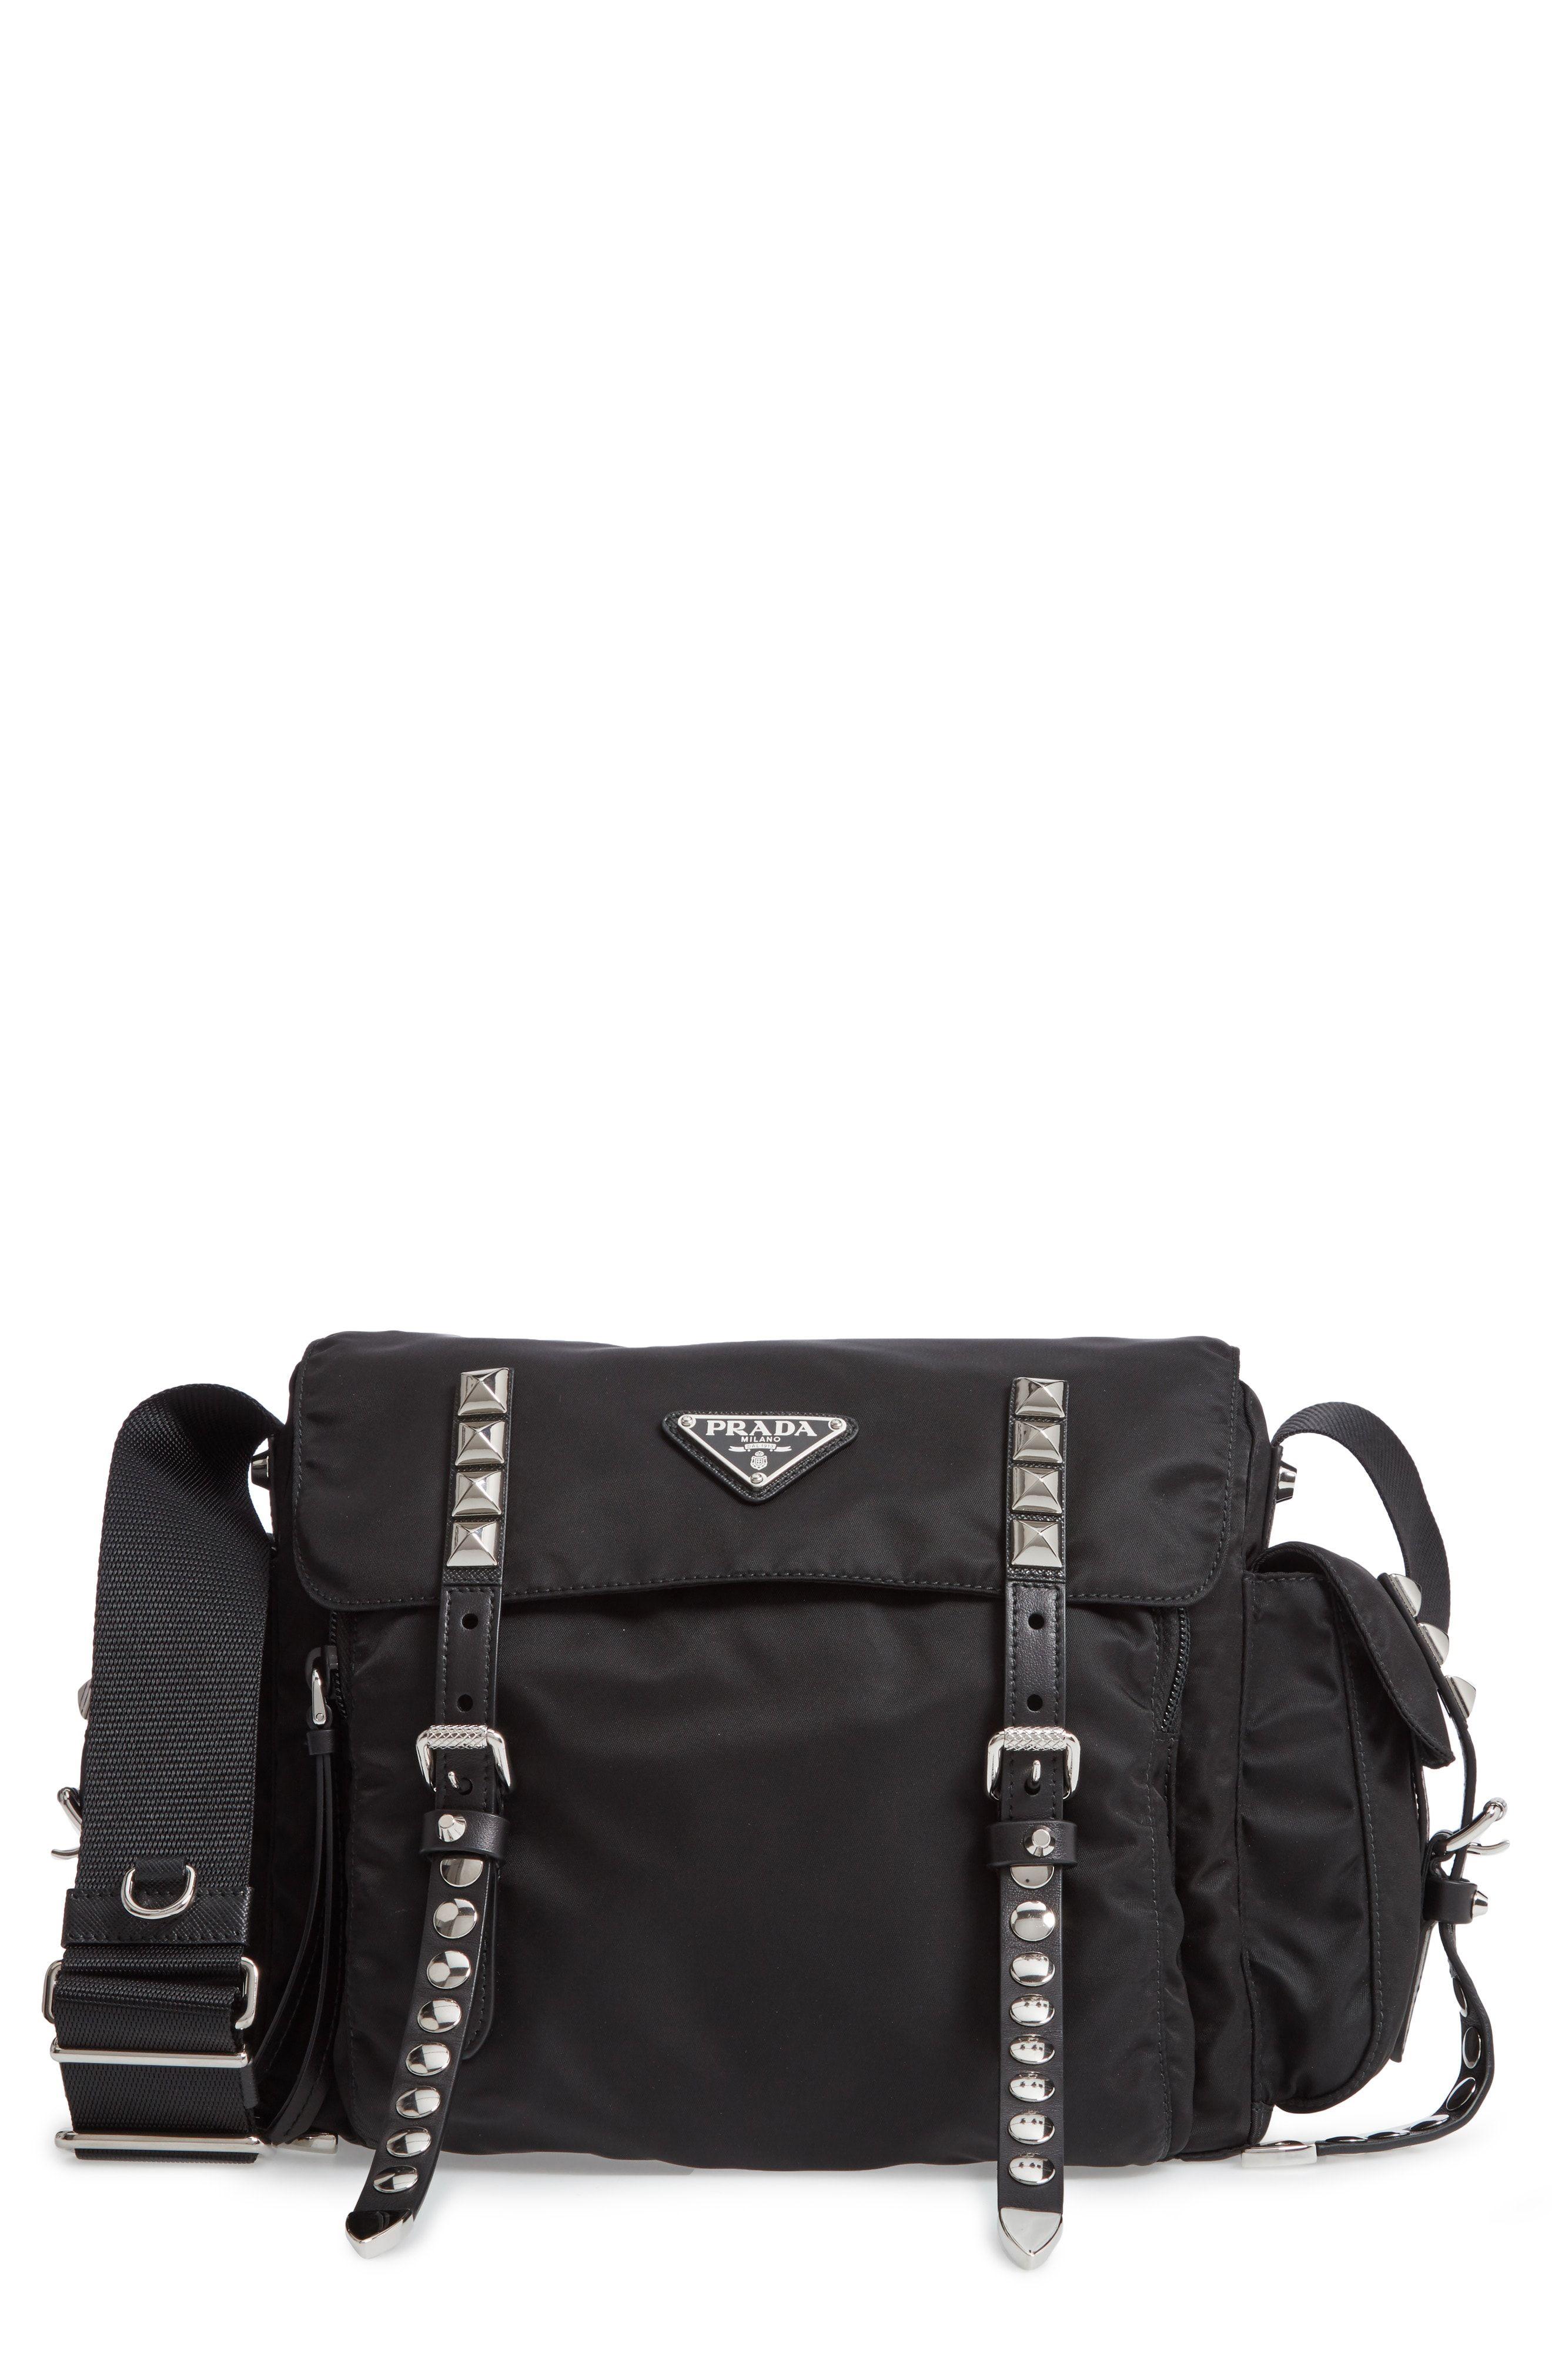 933df9920045 ... wholesale prada stud nylon messenger bag available at nordstrom f94b0  b43d6